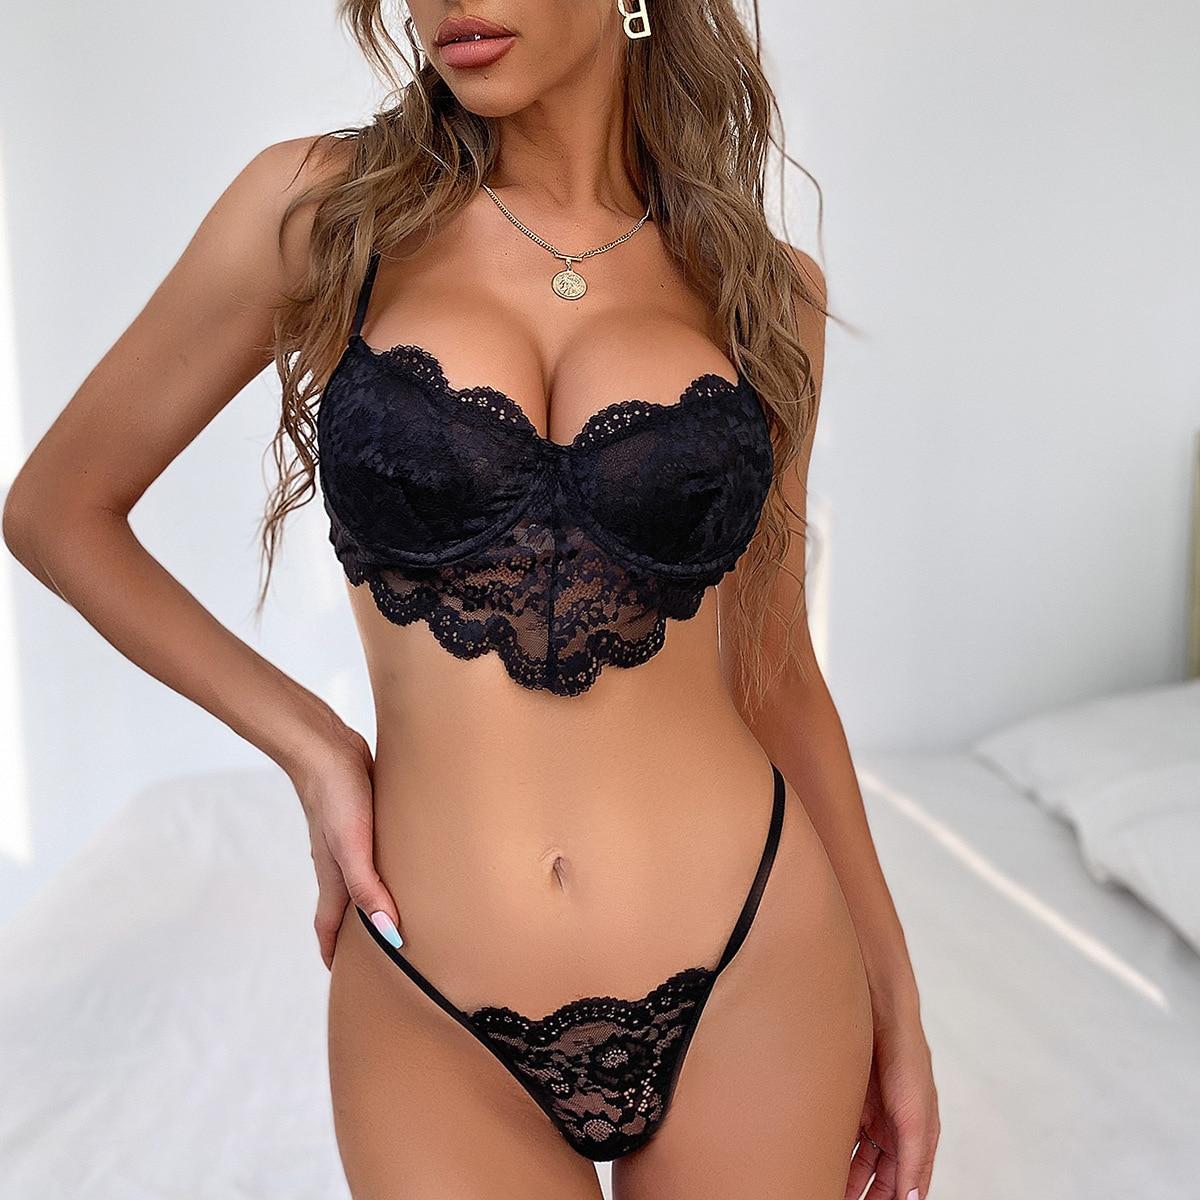 2 Pieces lace bra and panty set women sexy push up bra bodycon intimates lingerie set bralette lace brief set - underwear